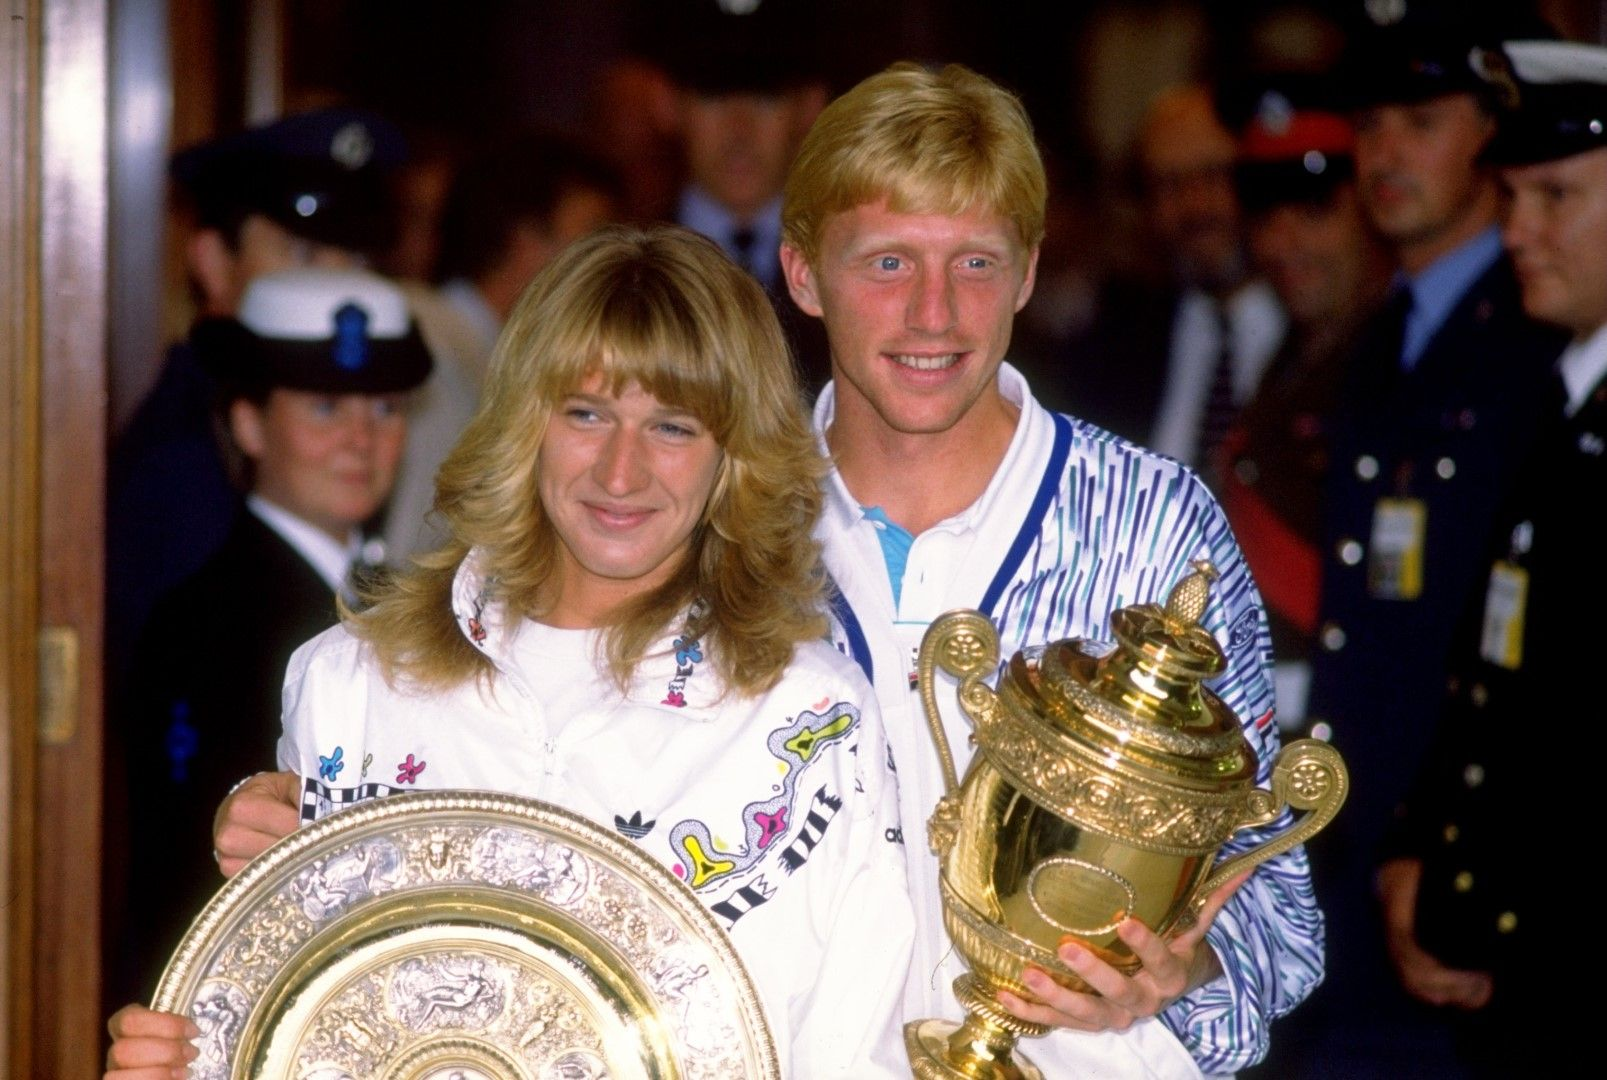 1989 г. Победителите от Германия - Щефи Граф и Борис Бекер